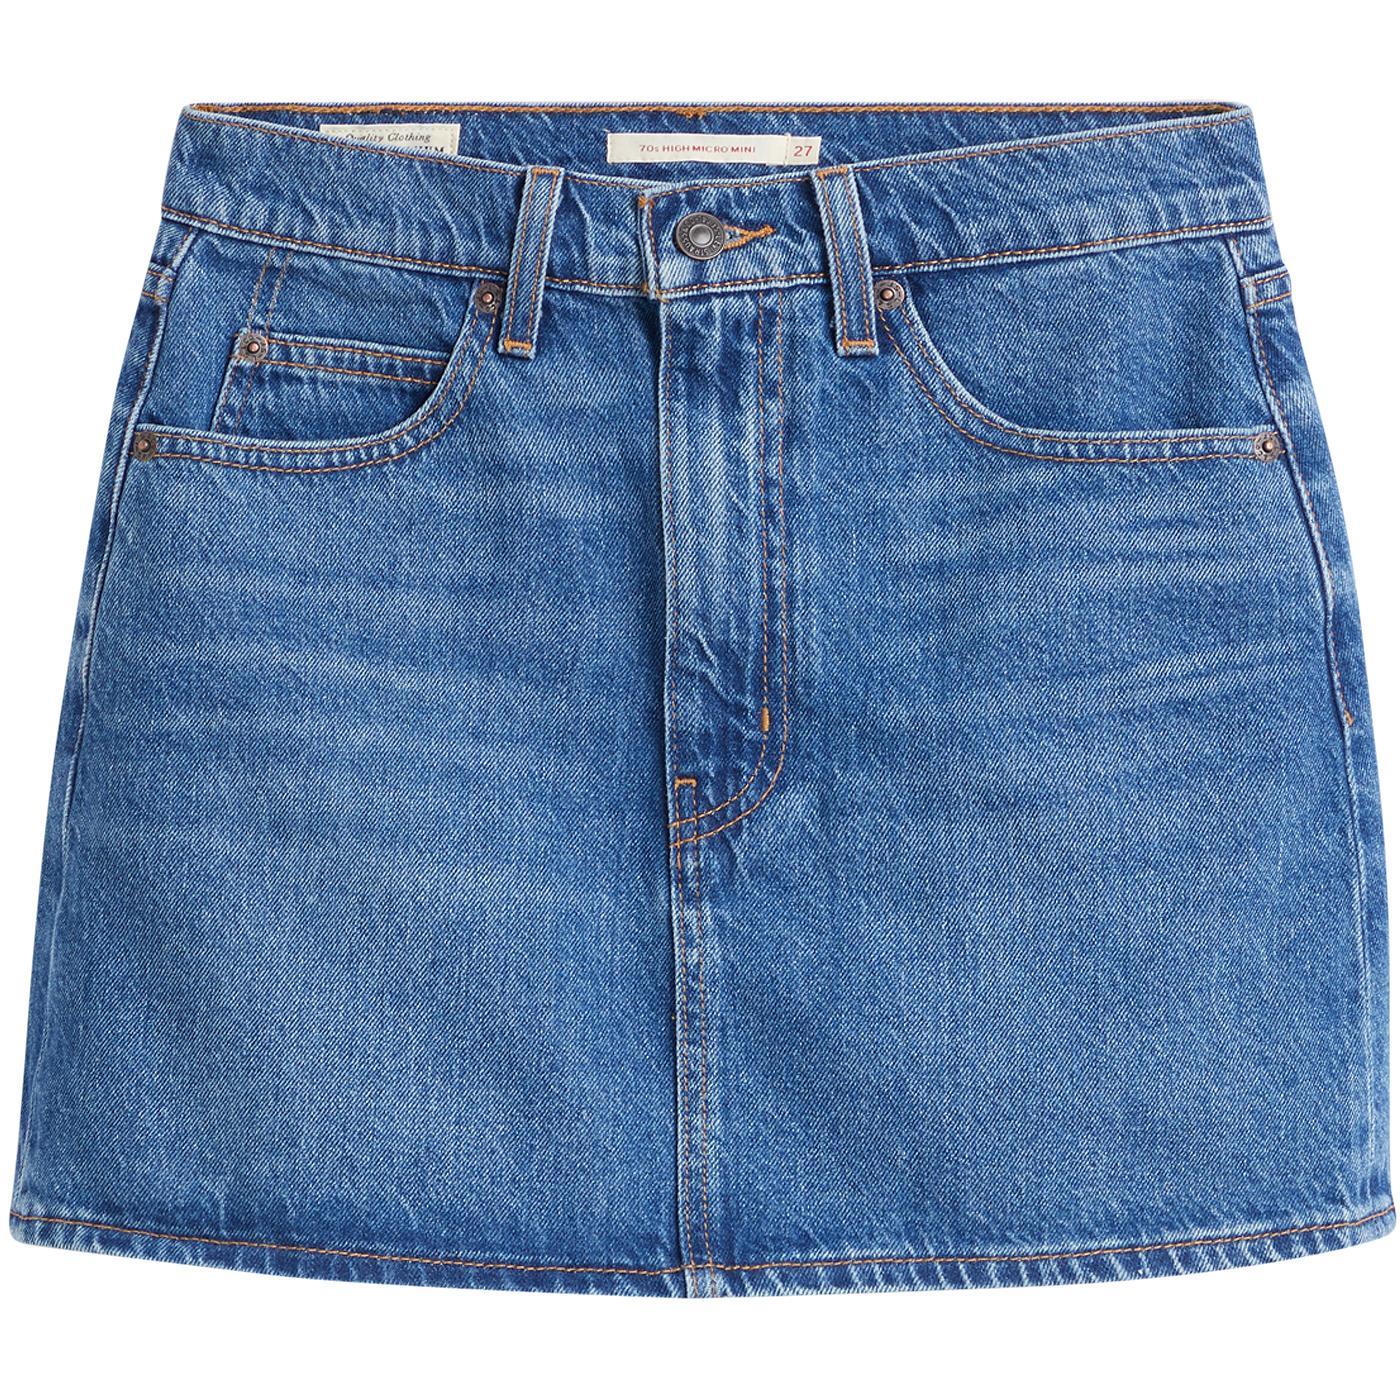 LEVI'S 70's High Retro Micro Mini Skirt (Mini Me)